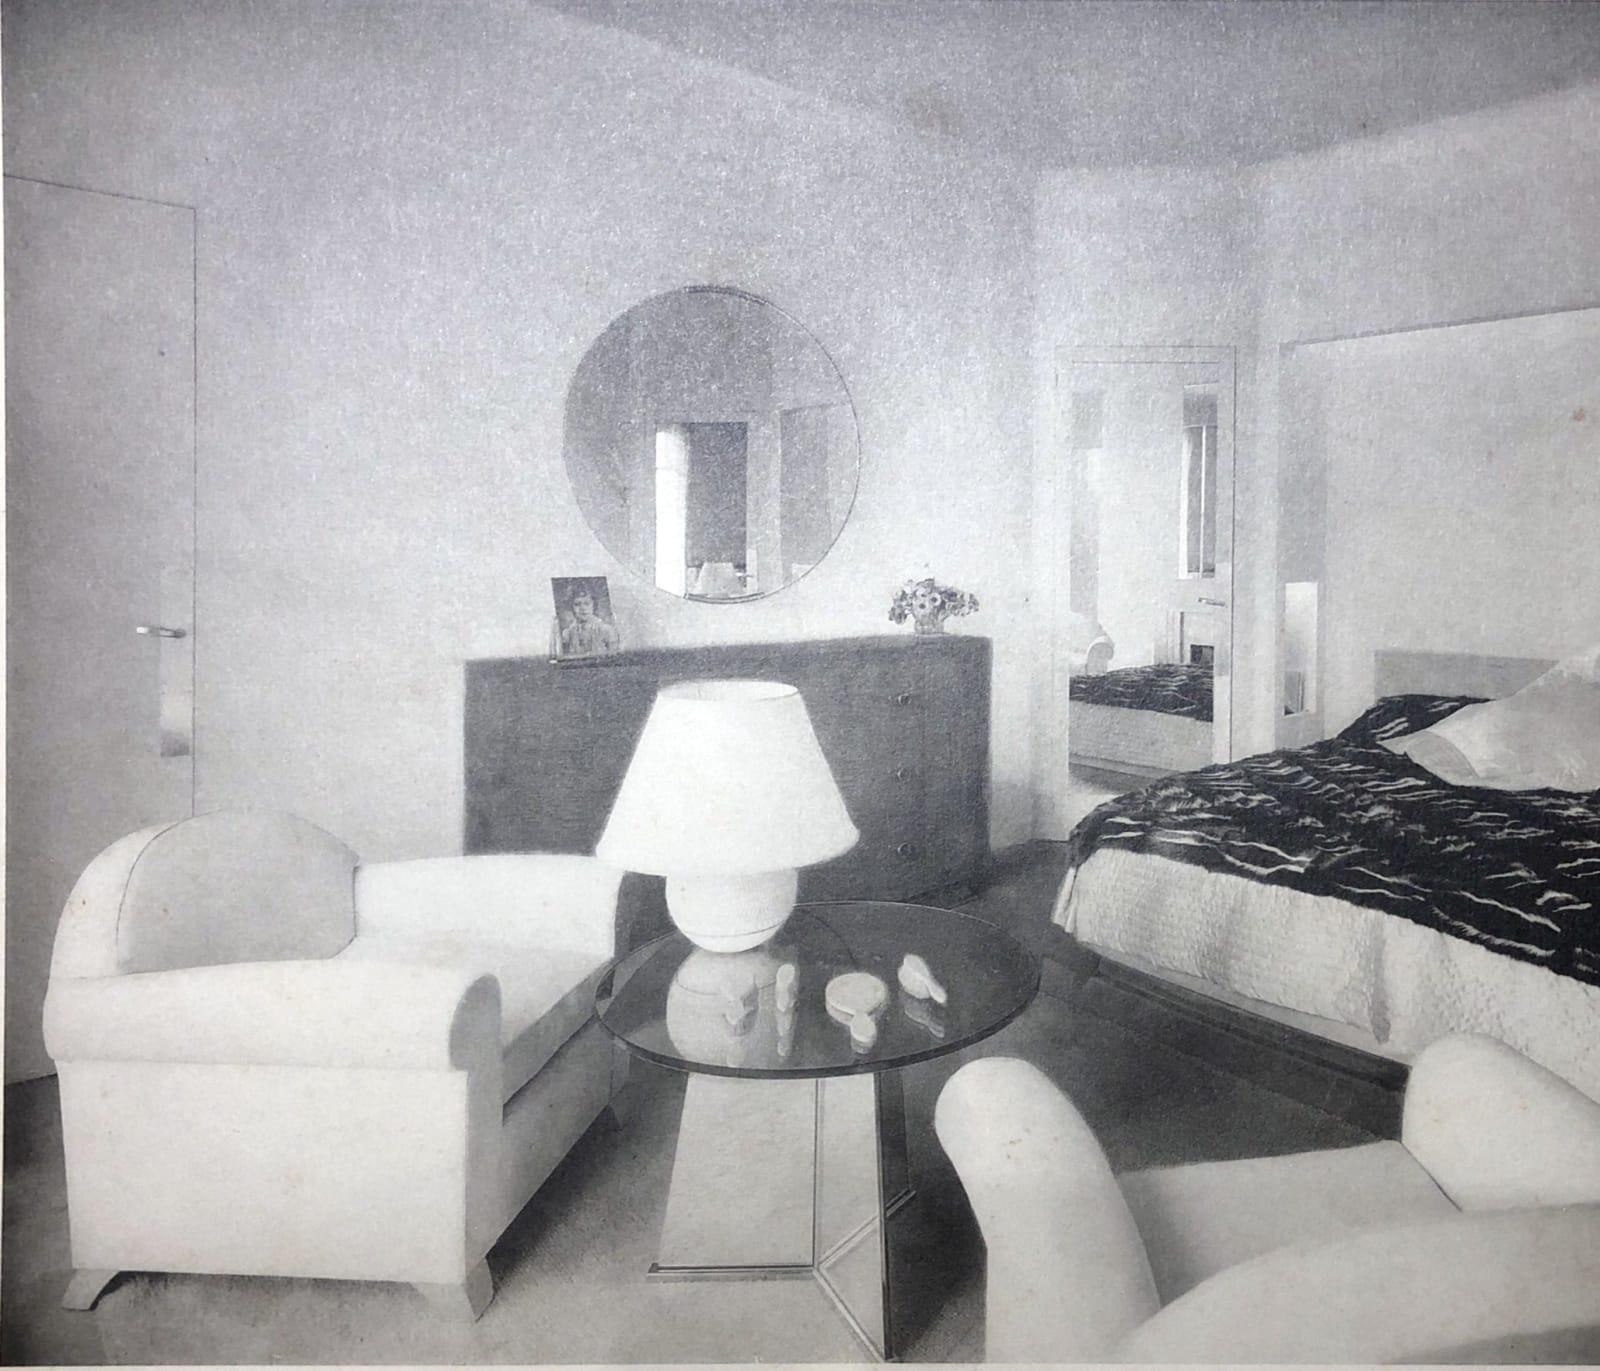 Lucie Renaudot Paris, 1934